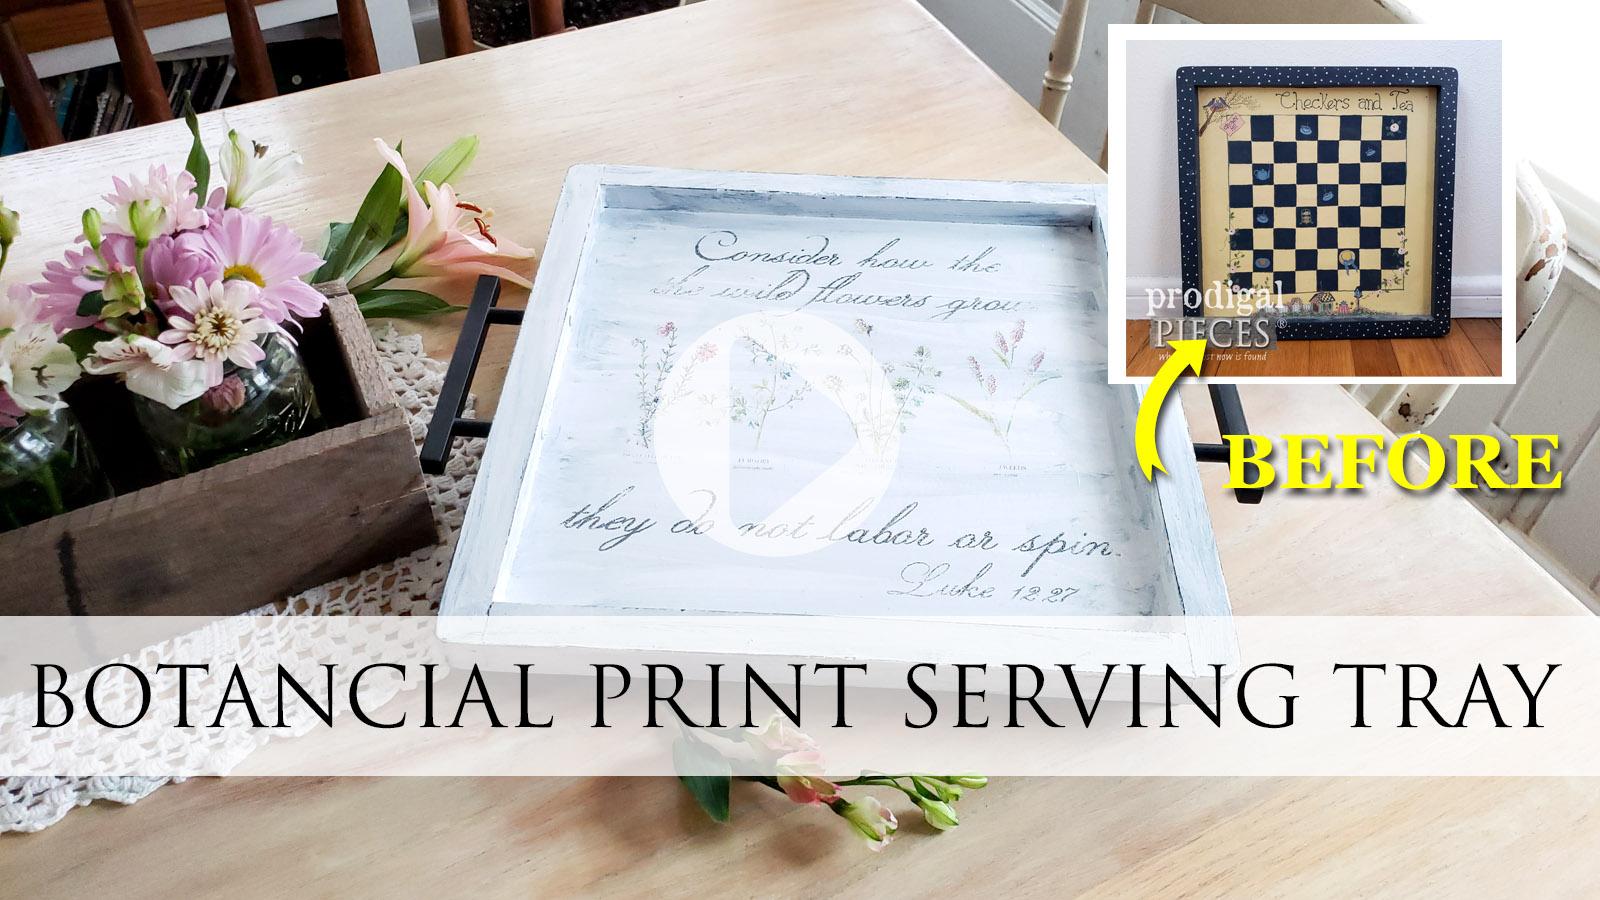 DIY Botanical Print Serving Tray Makeover by Larissa of Prodigal Pieces | prodigalpieces.com #prodigalpieces